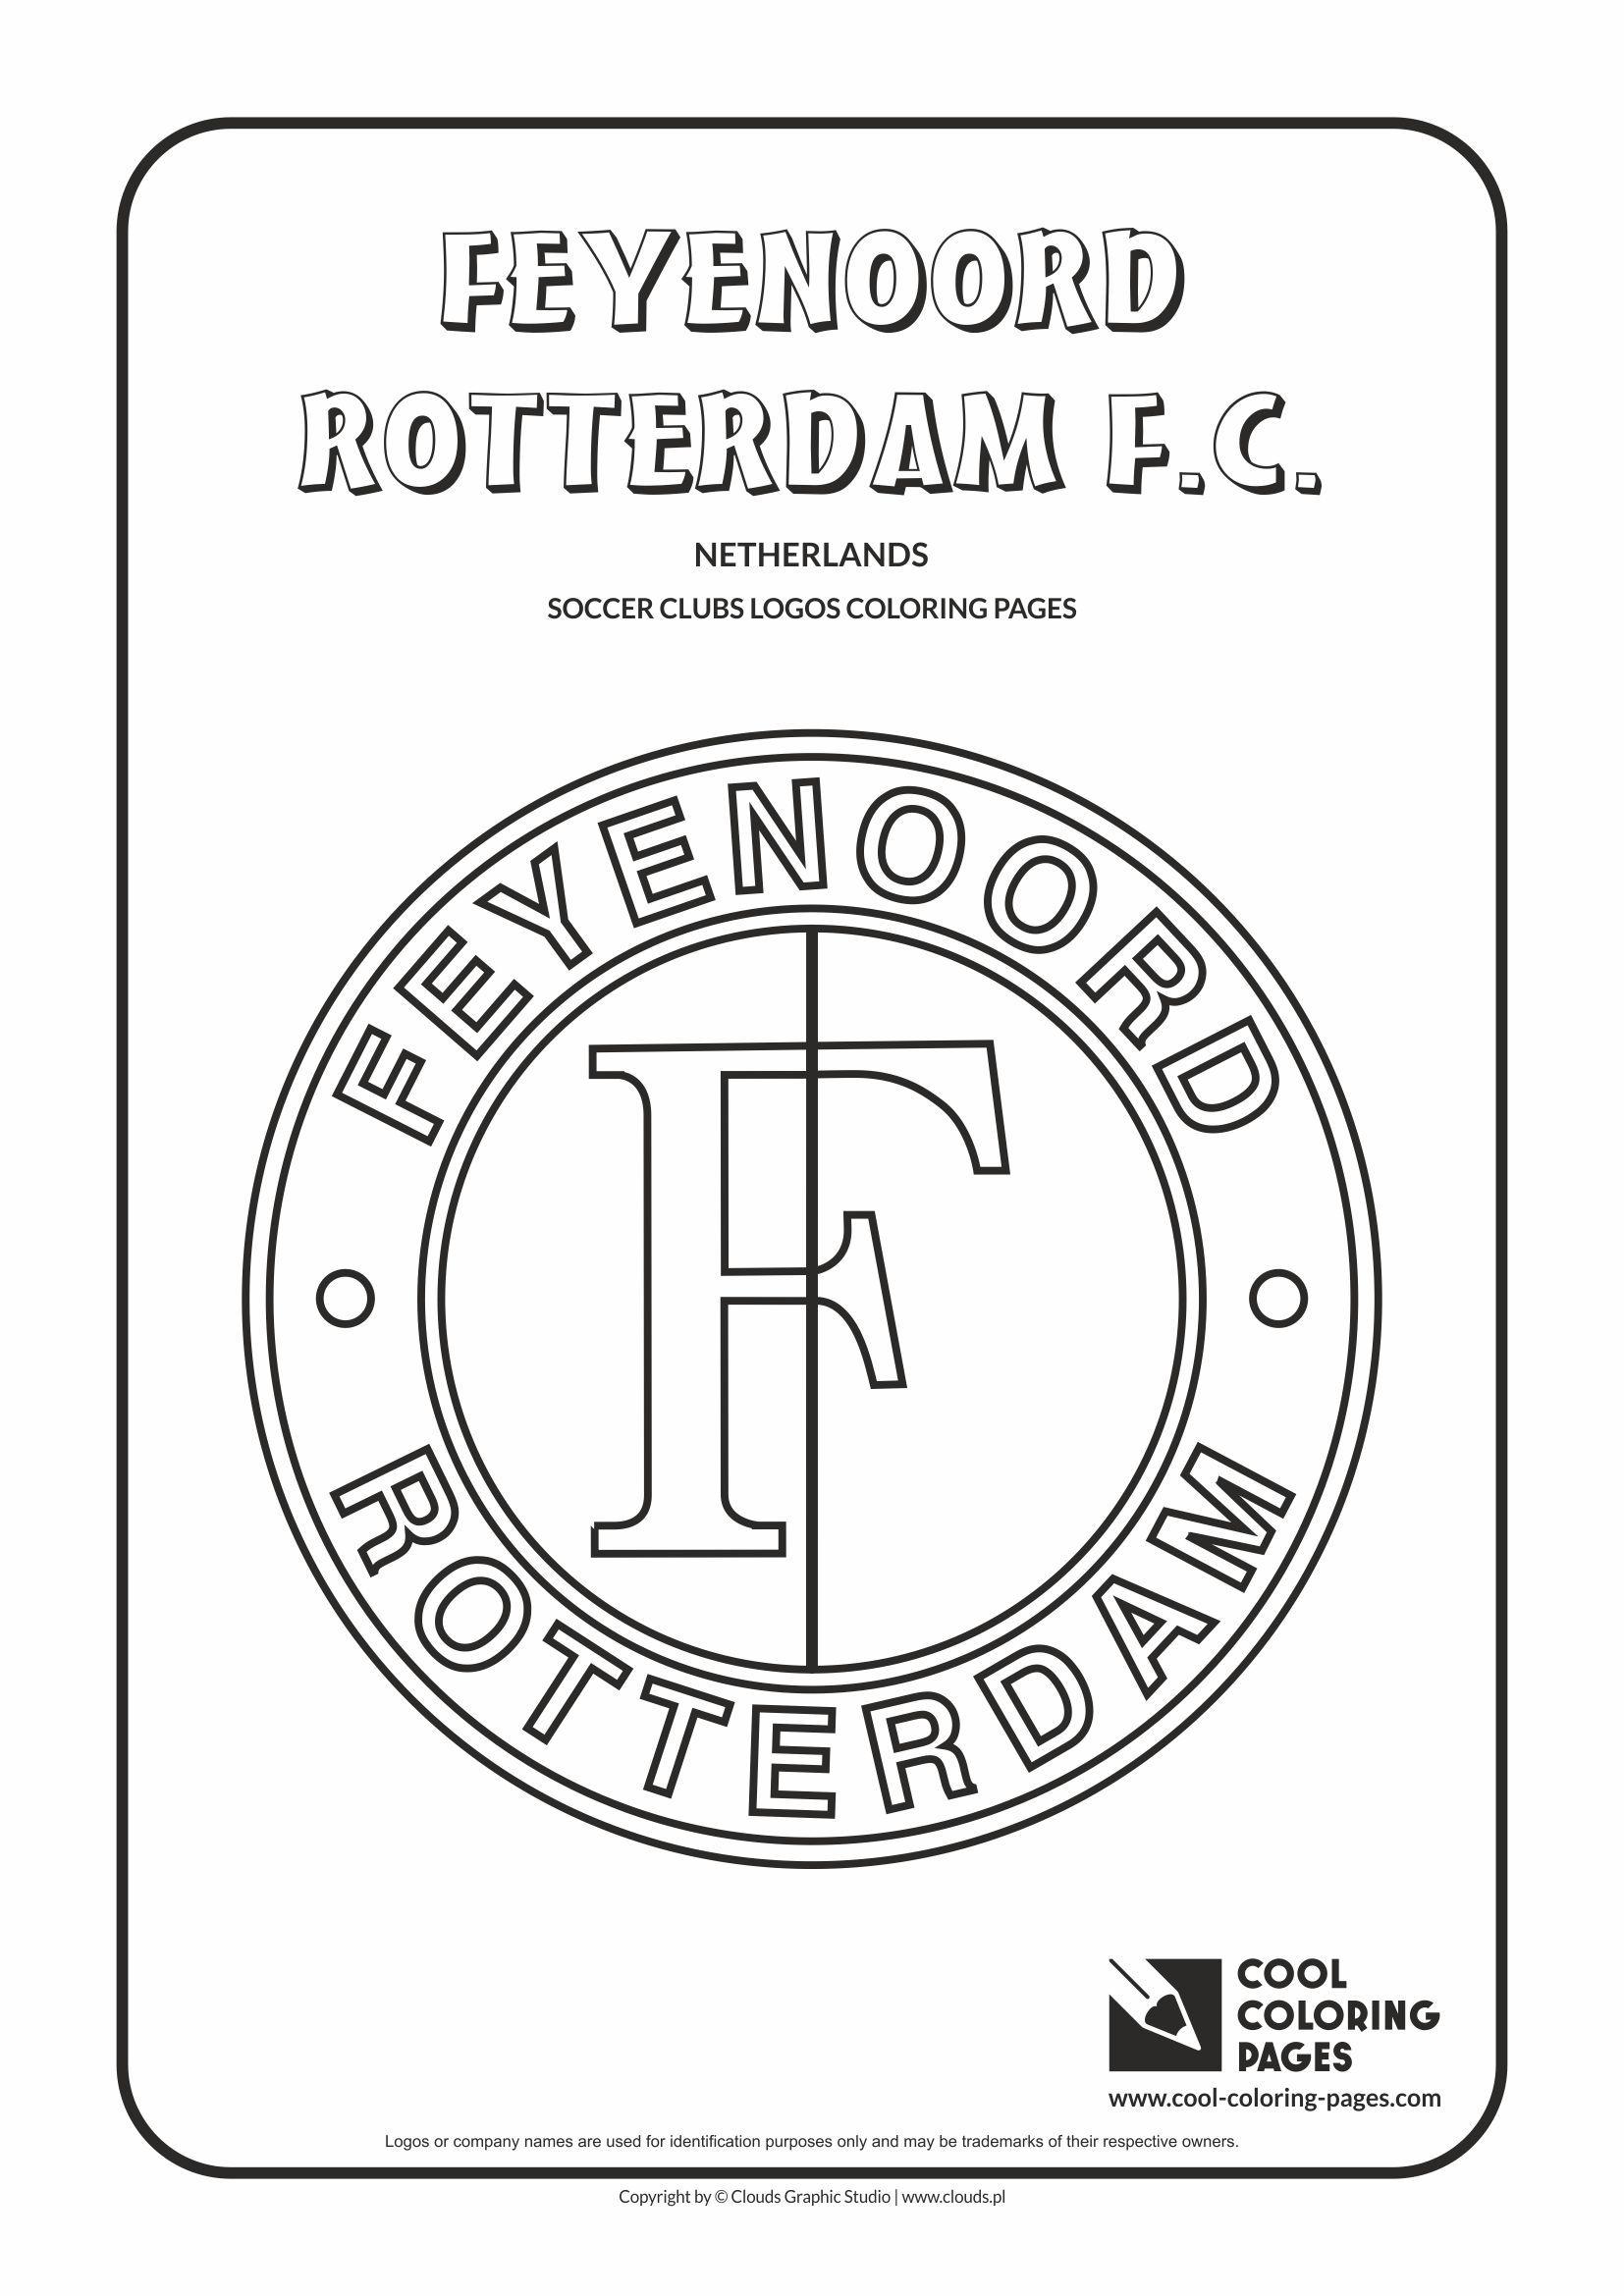 Feyenoord Rotterdam Logo Coloring Page Cool Coloring Pages Coloring Pages Logo Color